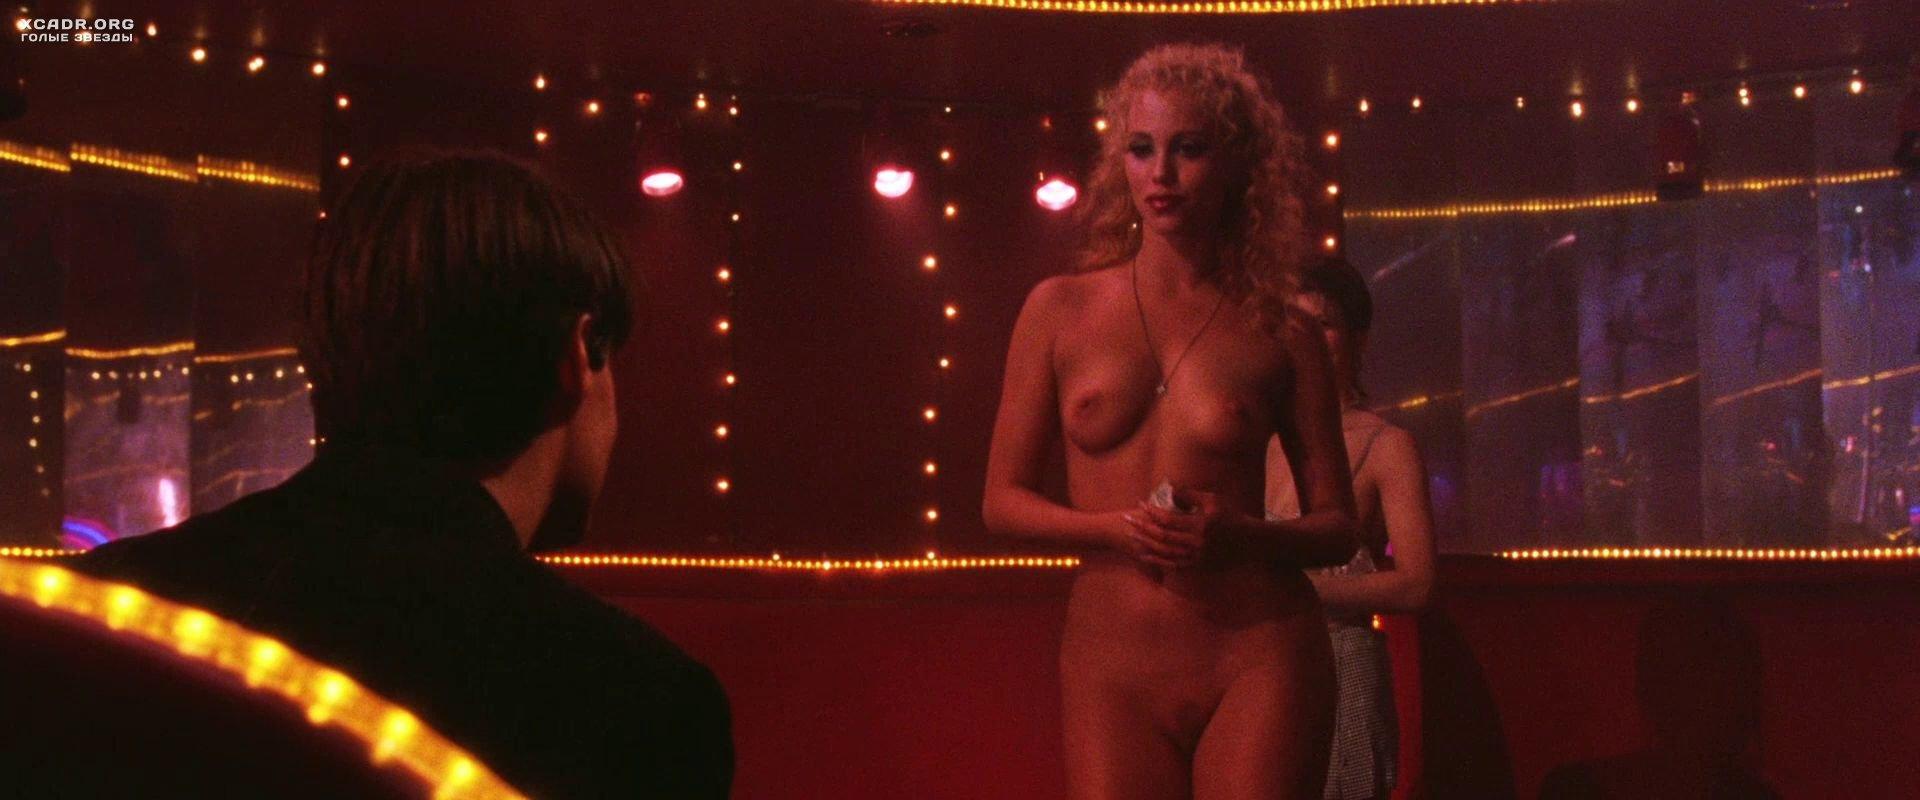 bikini-strip-sex-movie-watchman-porno